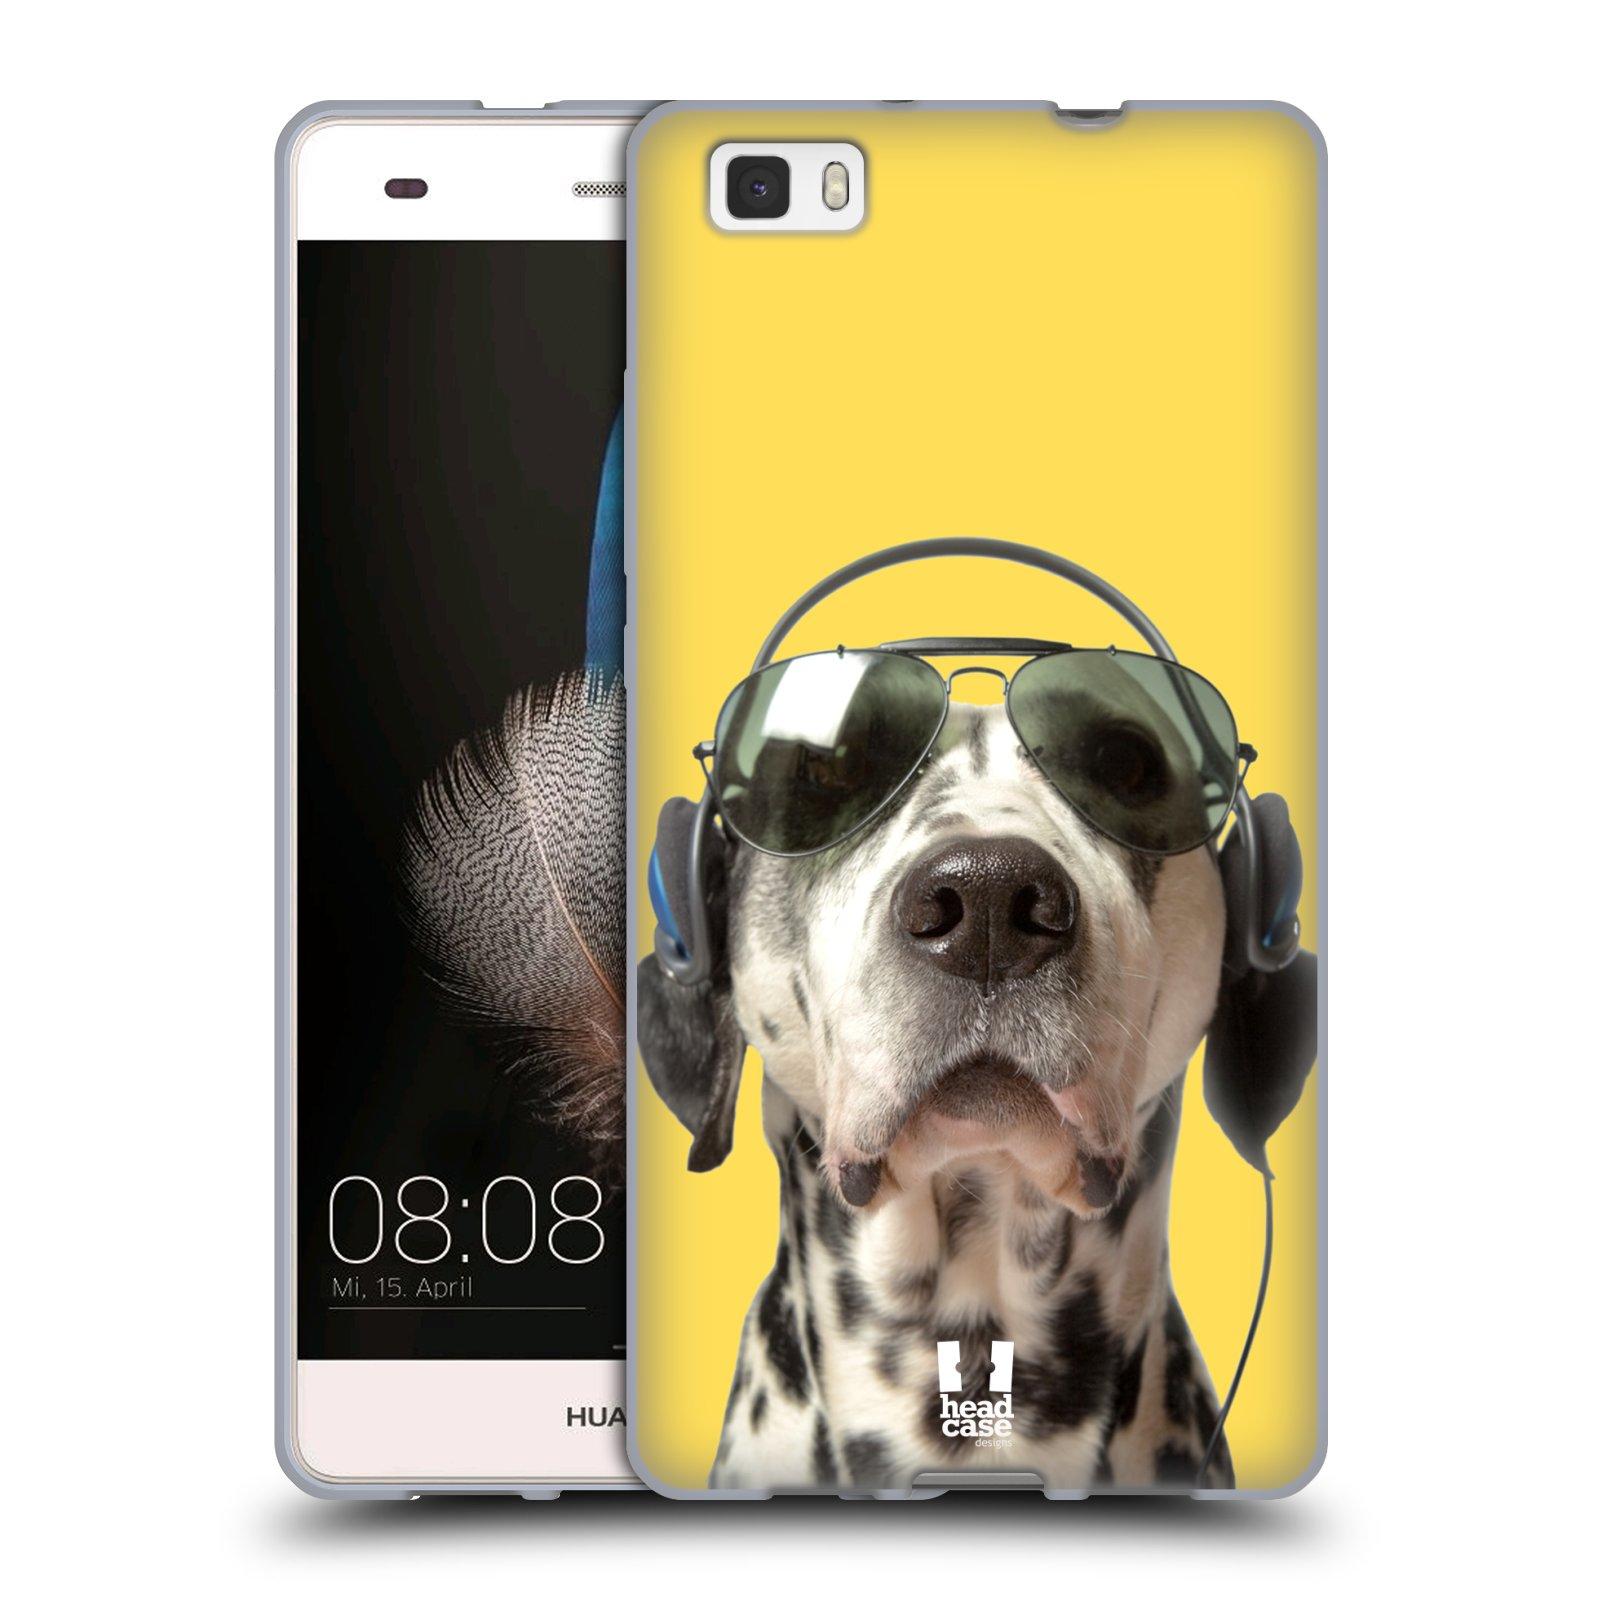 HEAD CASE silikonový obal na mobil Huawei  P8 LITE Legrační zvířátka Dalmatin se sluchátky